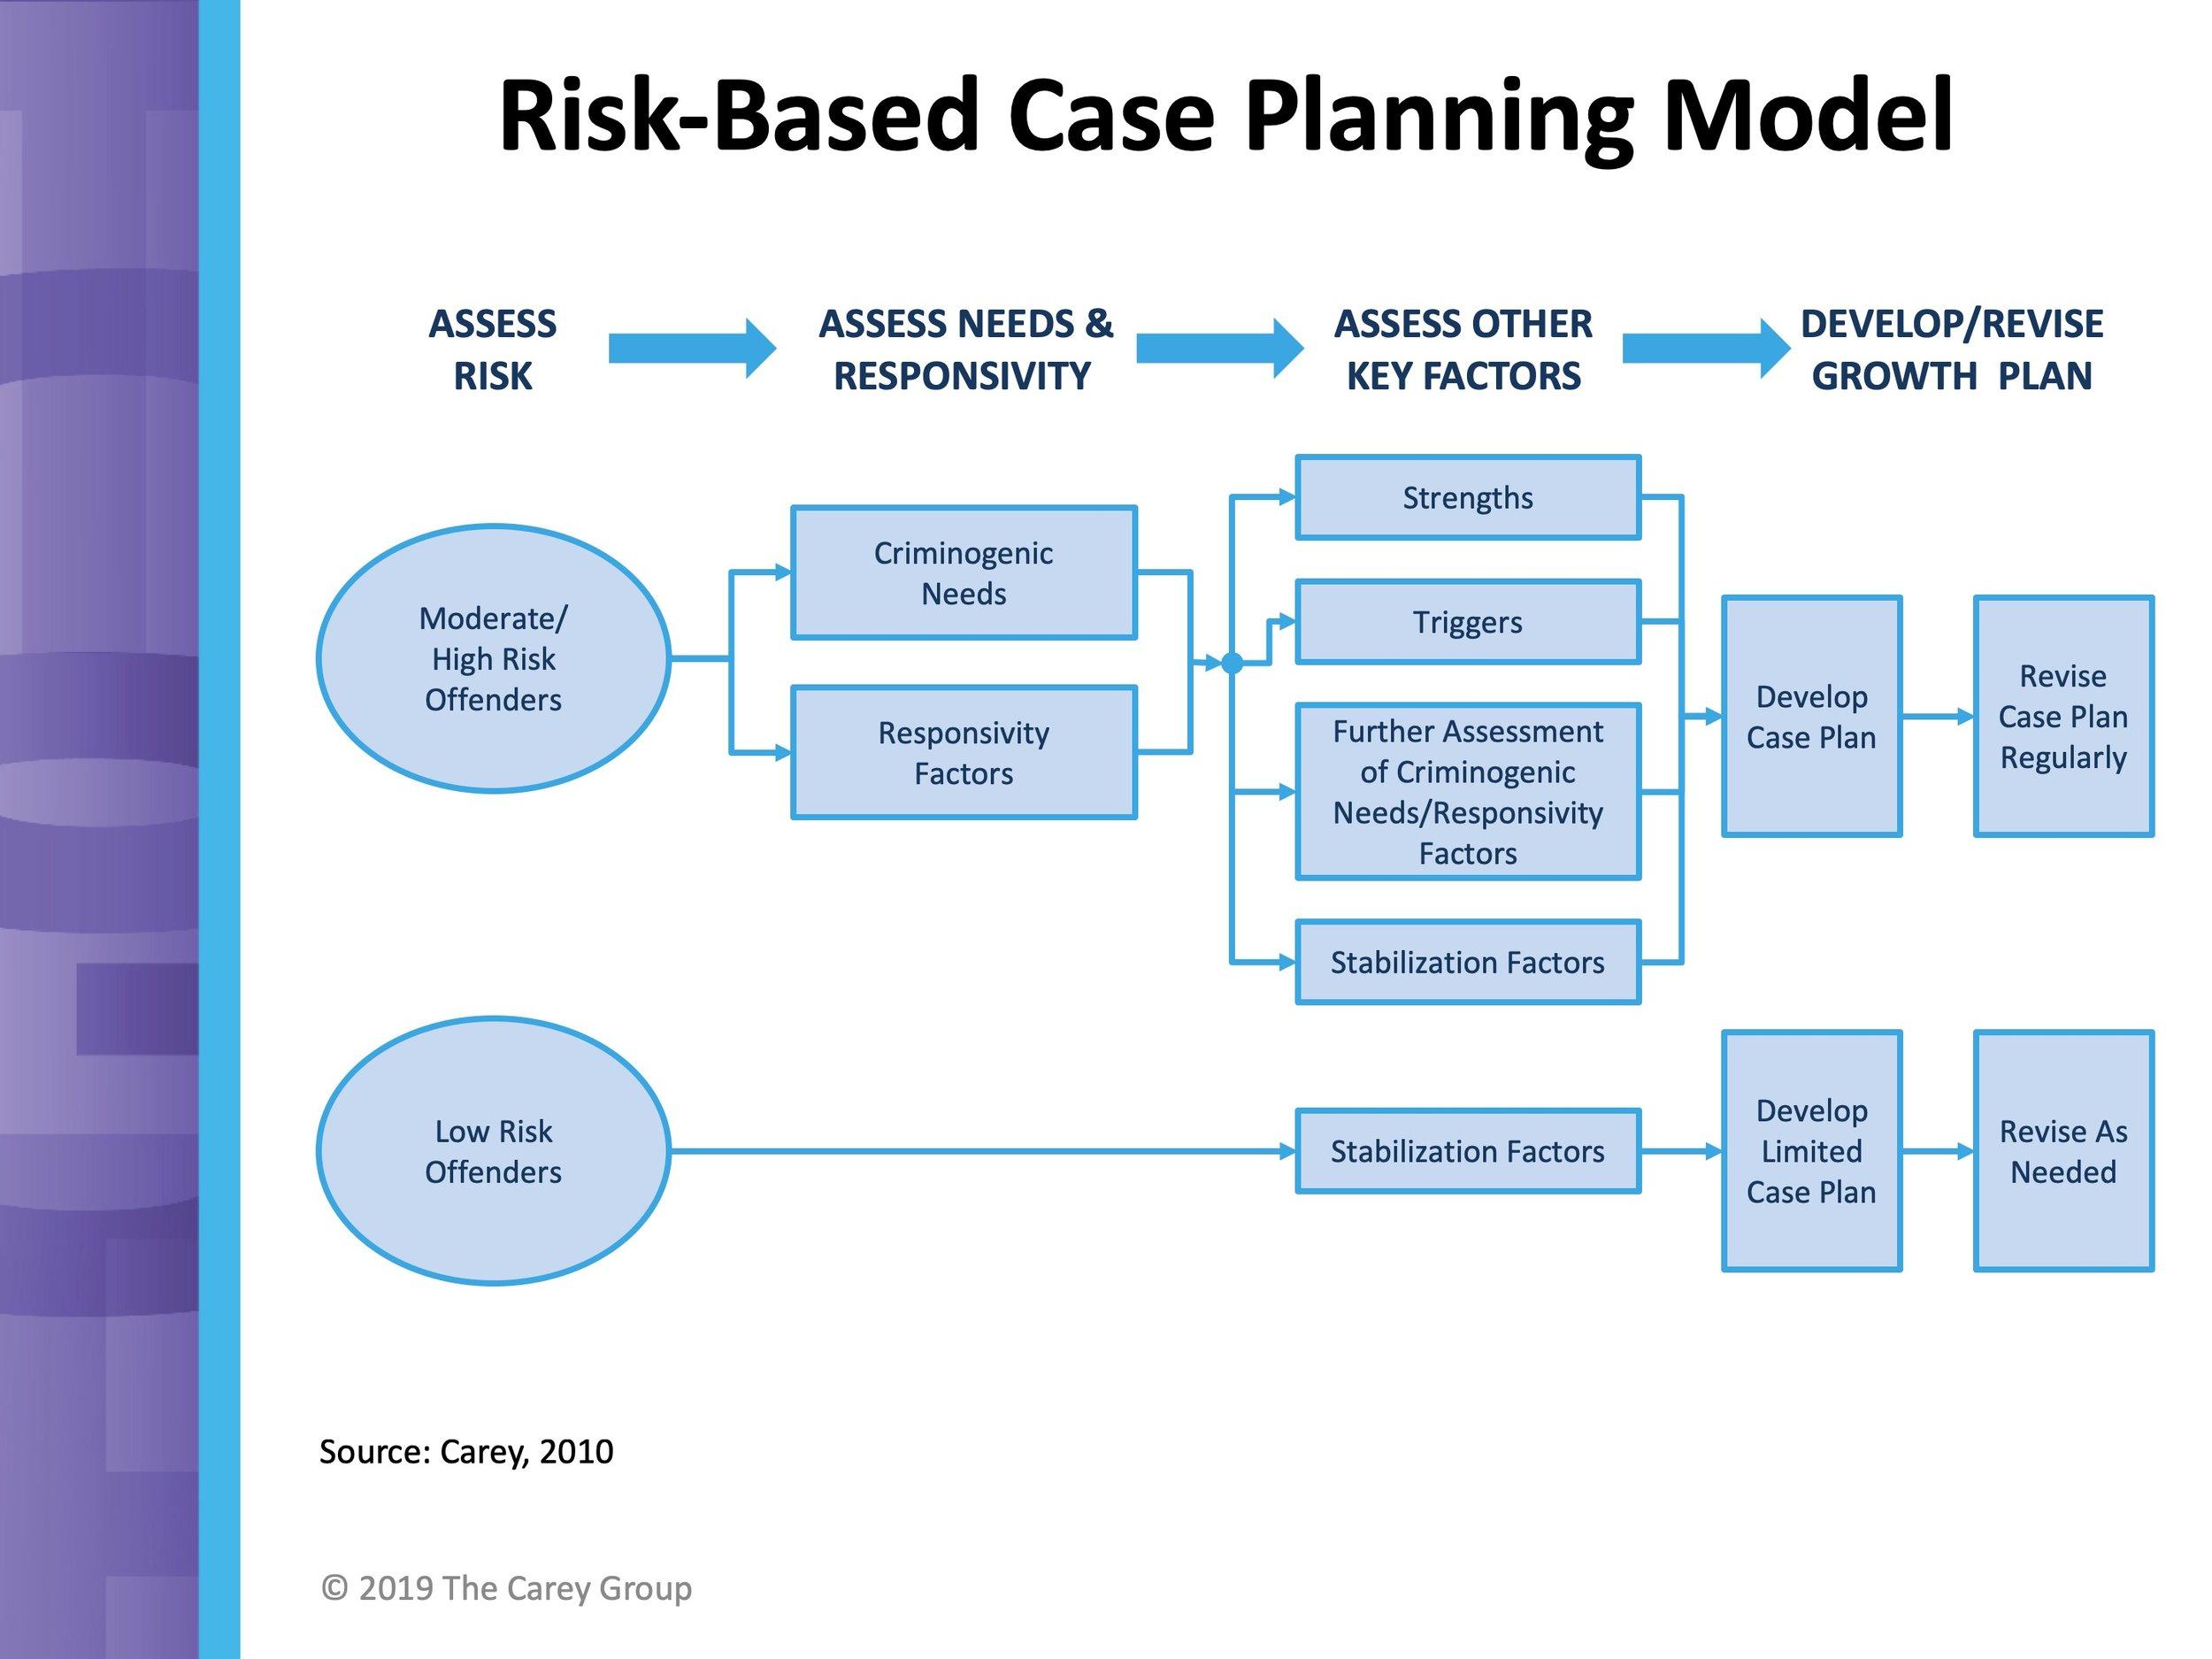 CasePlanningModel.jpg